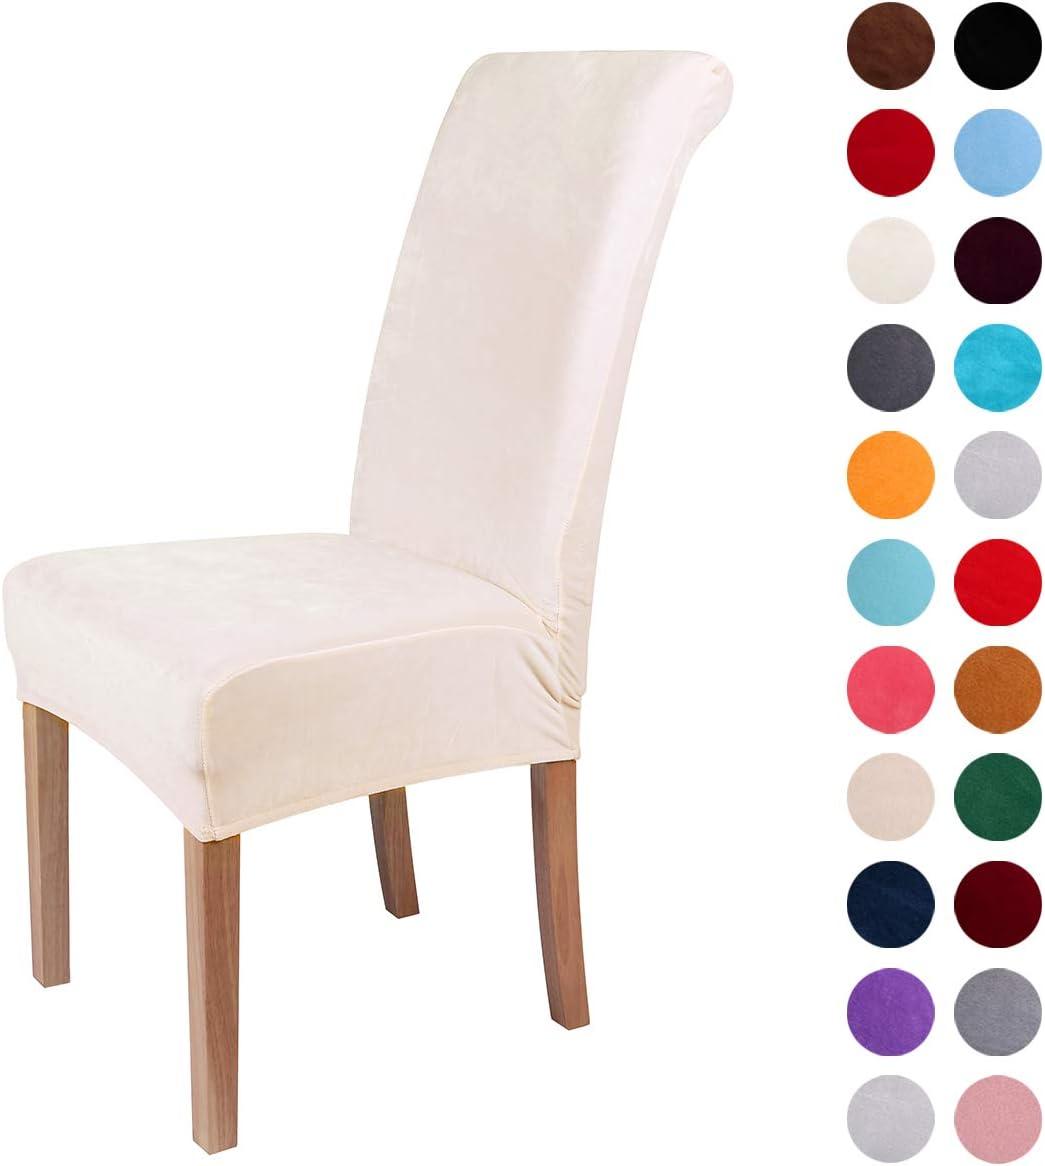 Colorxy Velvet Spandex Fabric Stretch Dining Room Chair Slipcovers Home Decor Set of 4, Cornsilk